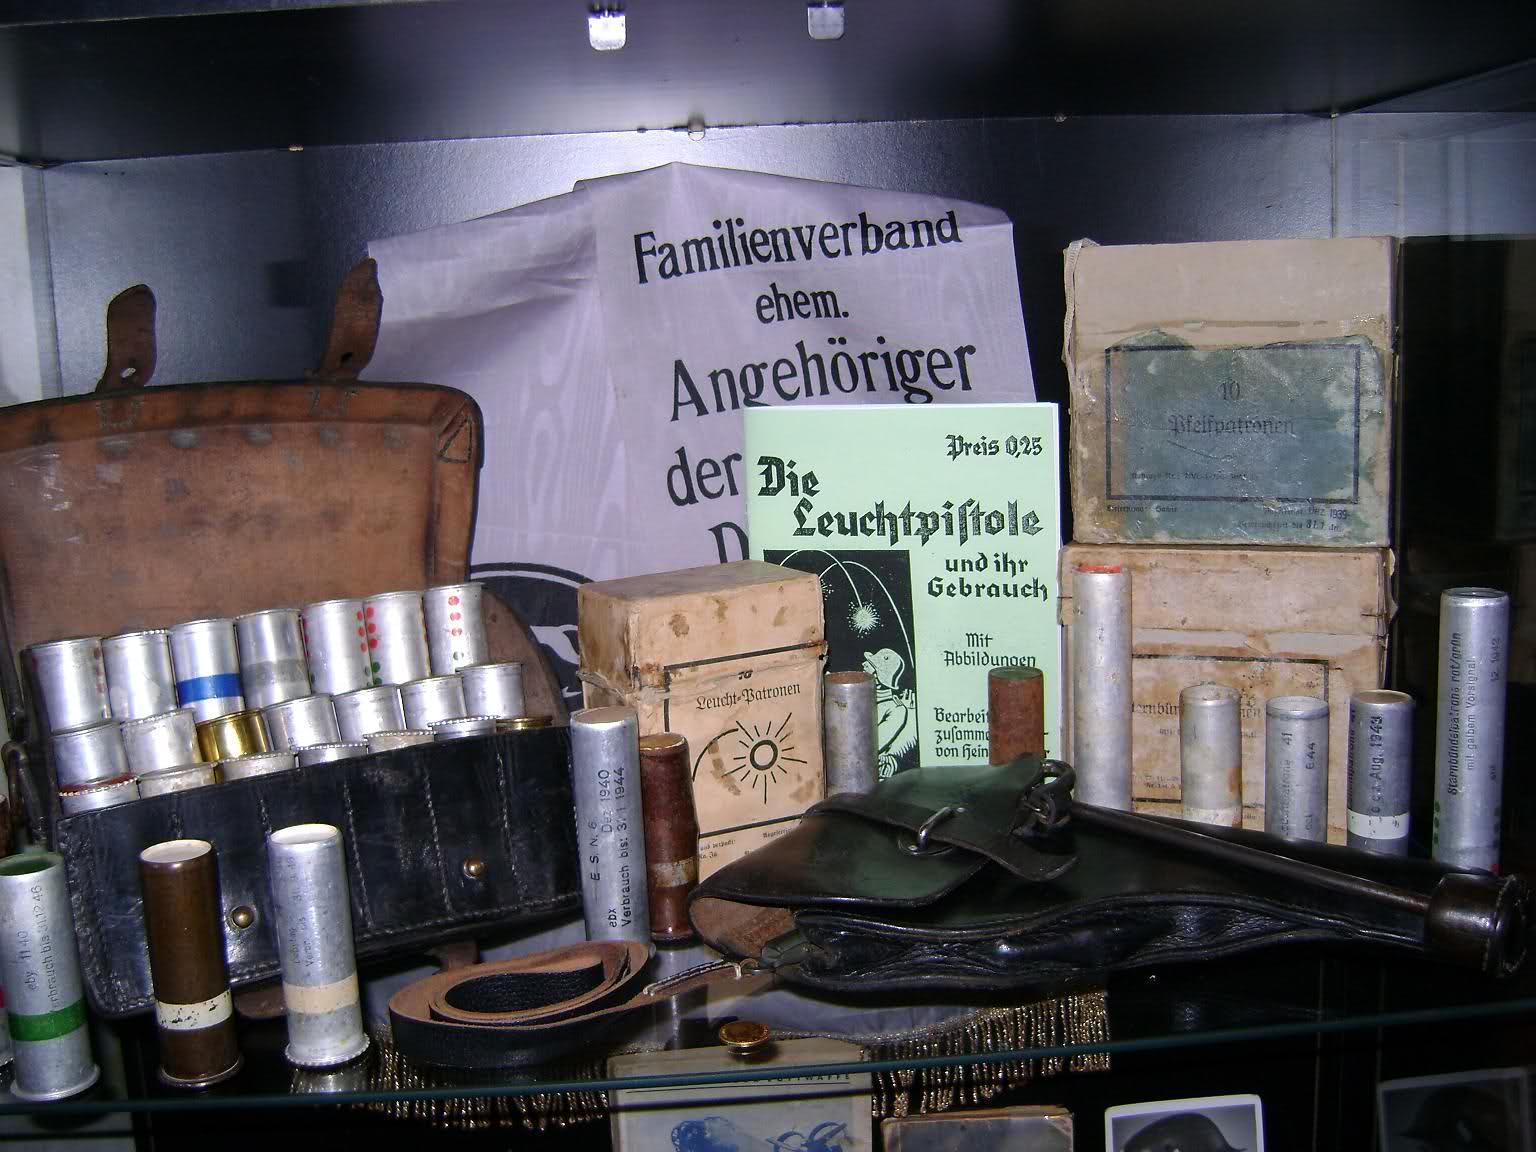 Collec de Minelab0 en allemand WW2 2582j6a